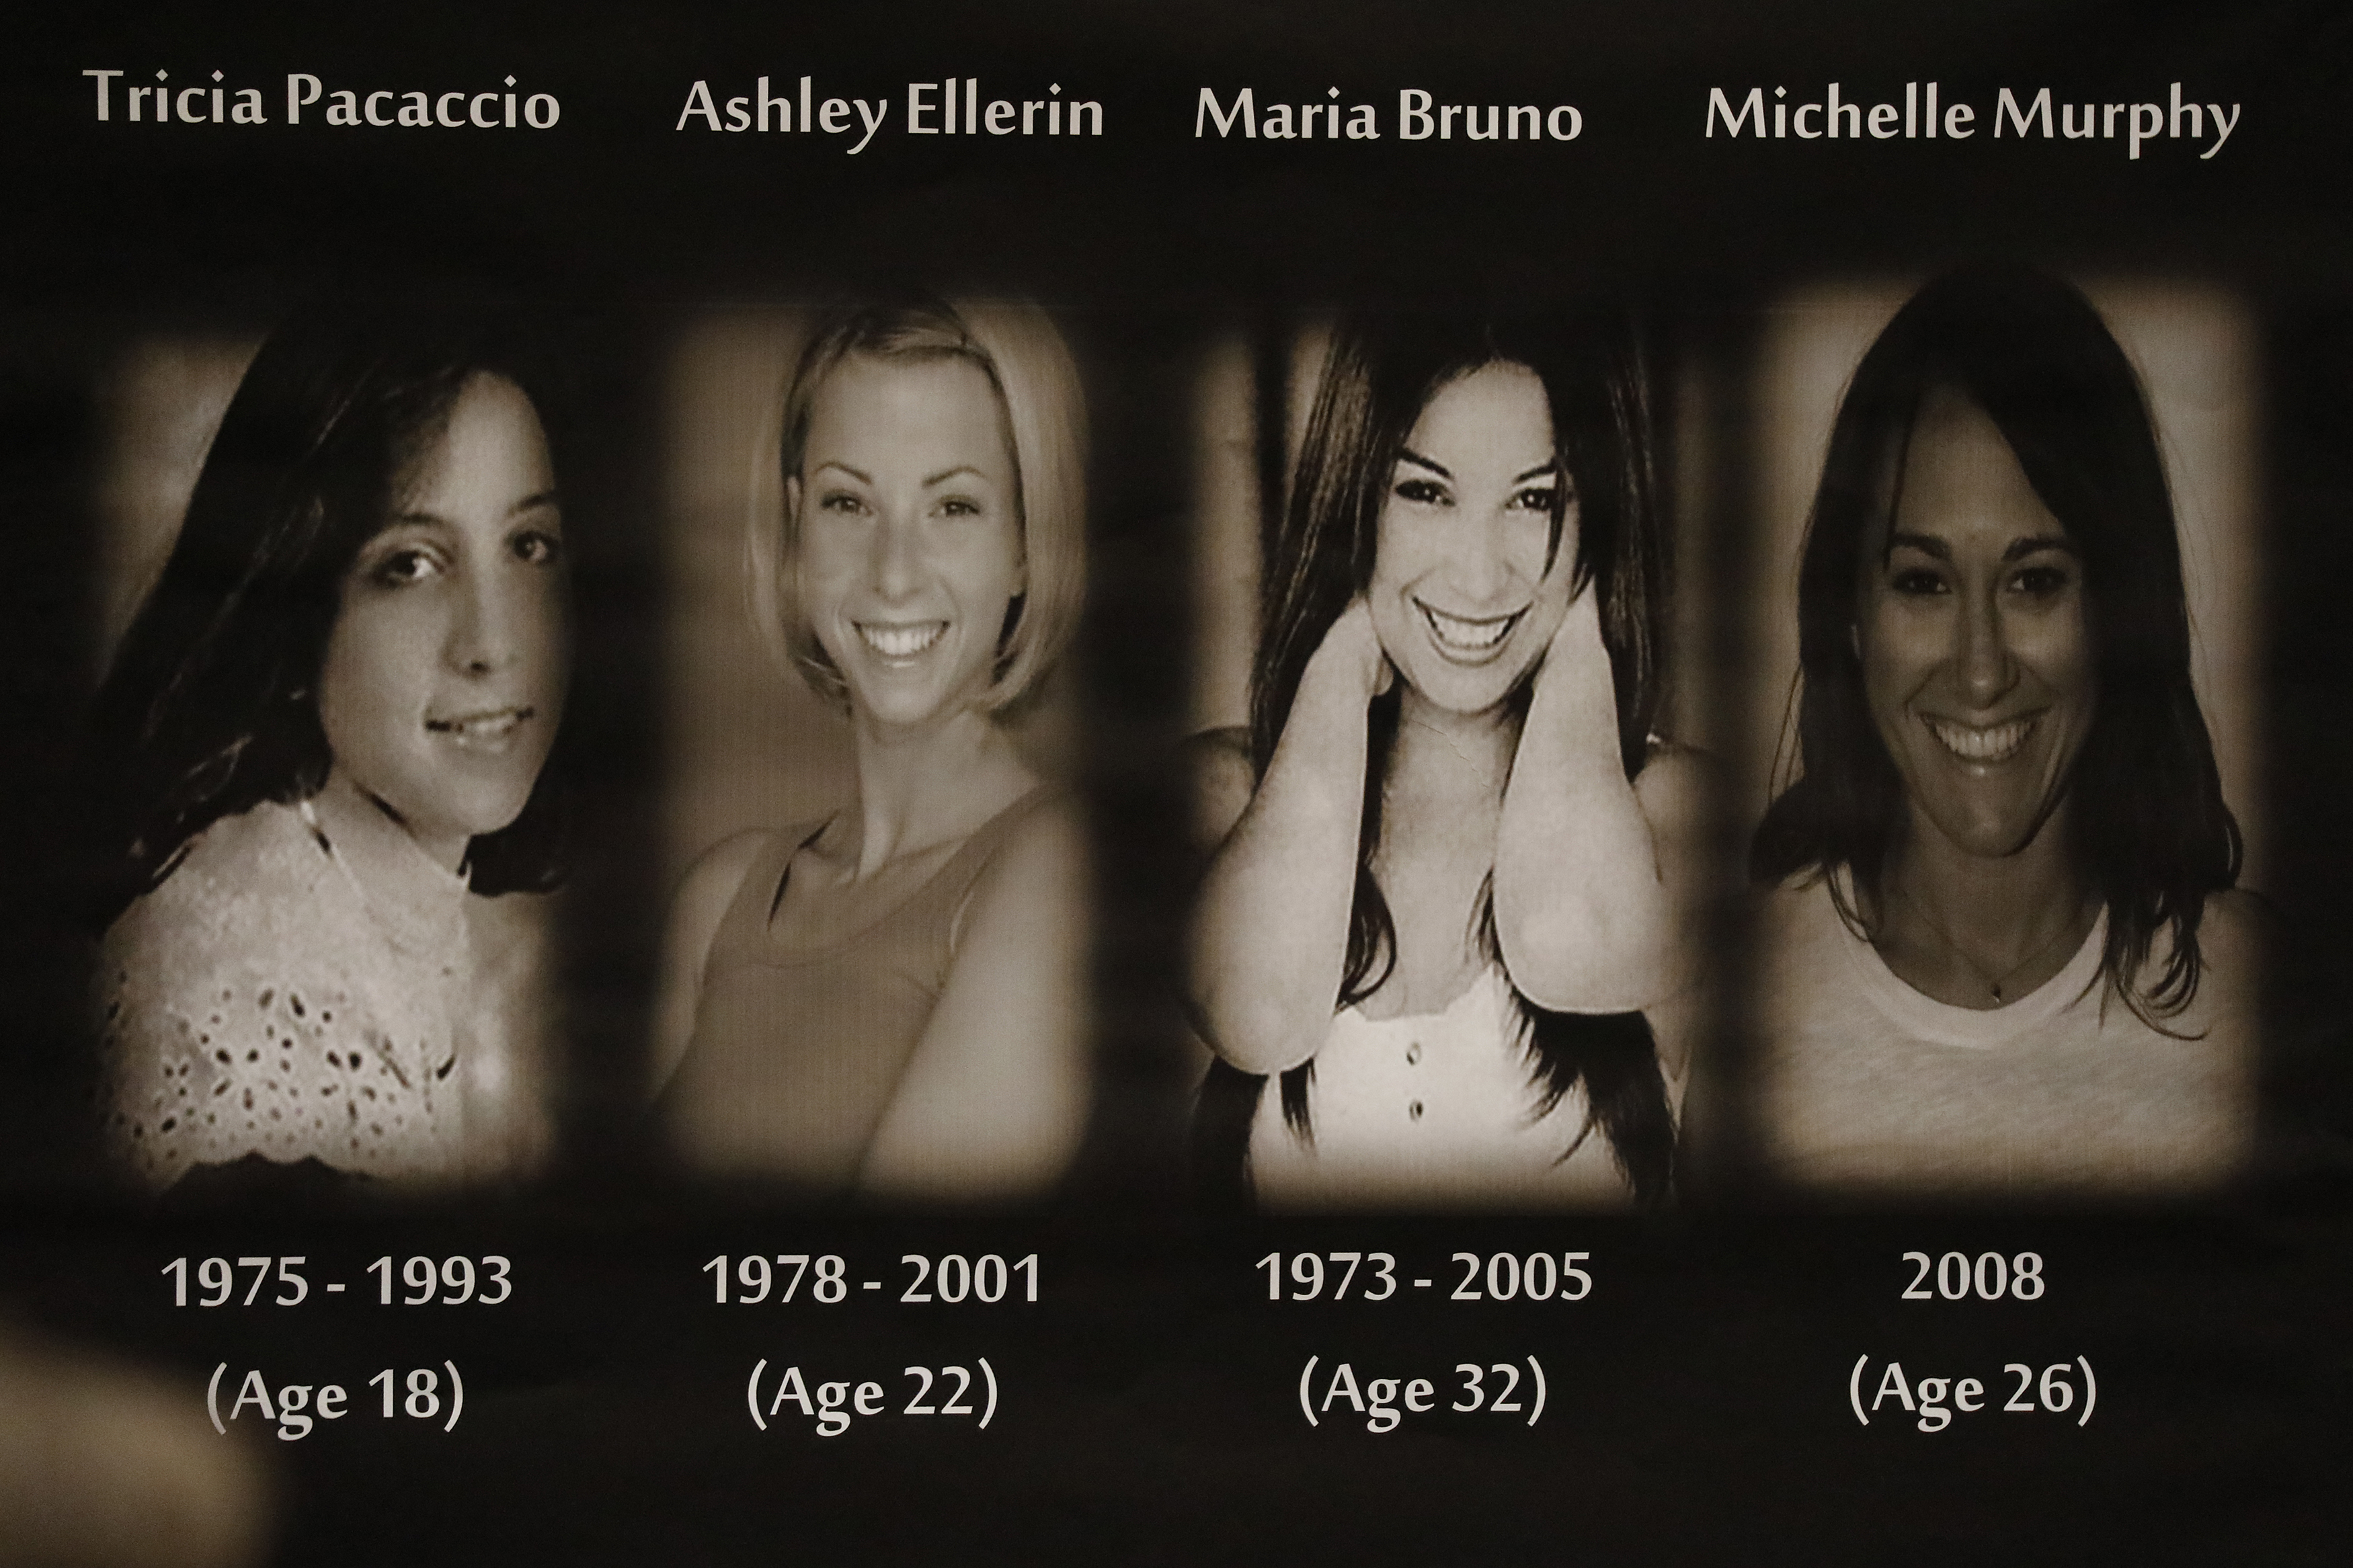 Victims of serial killer Michael Gargiulo